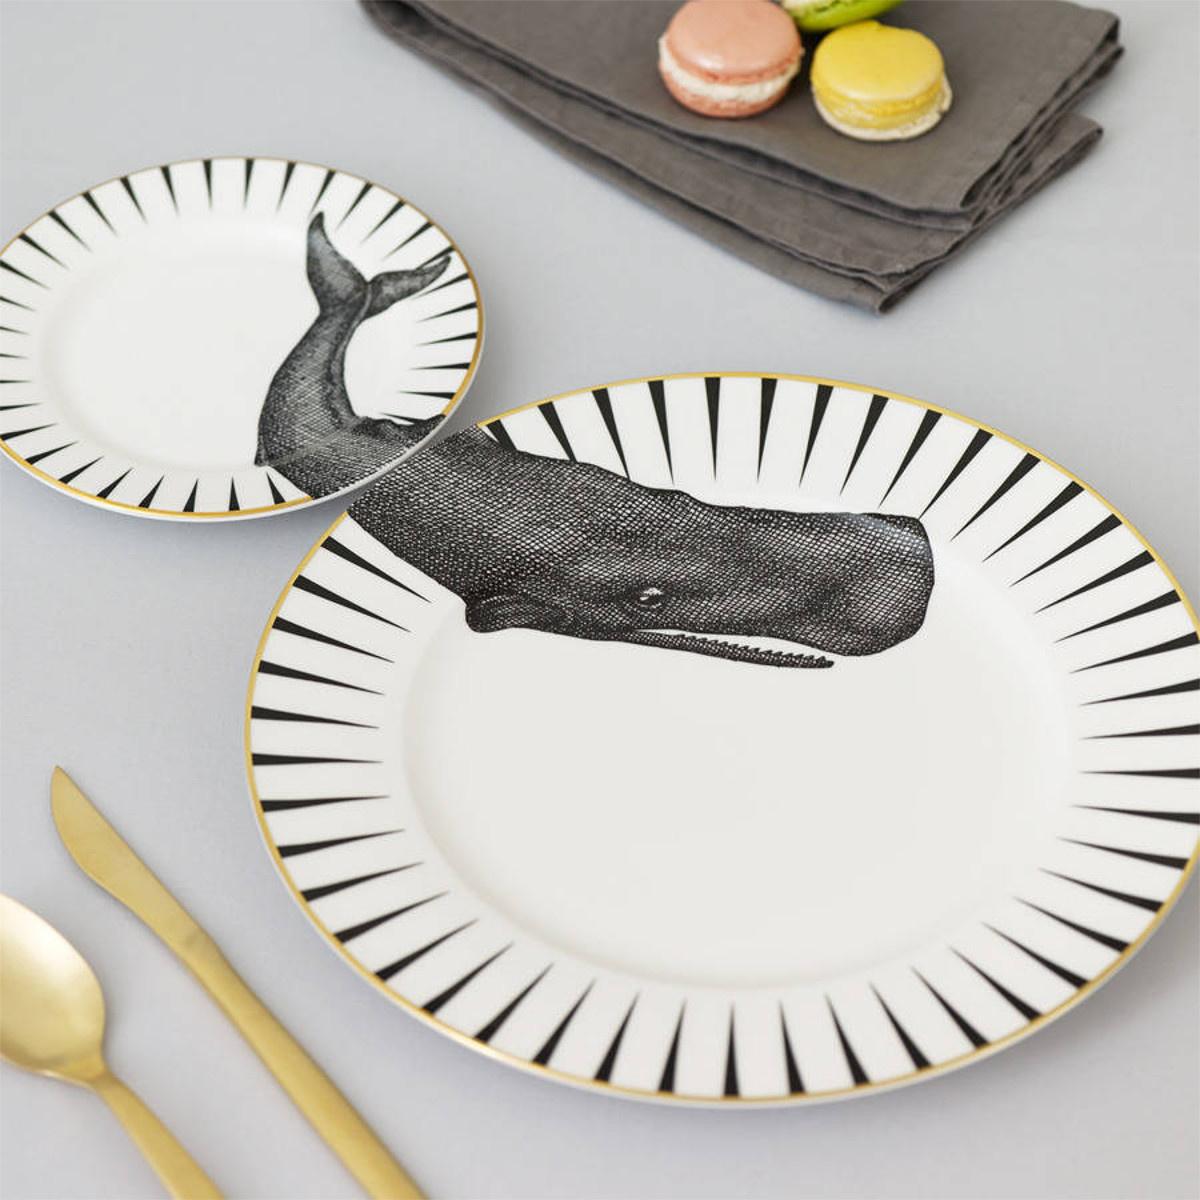 Yvonne Ellen Yvonne Ellen London Monochrome Set of1 Dinner Plate Ø 26,5 cm and 1 Side Plate Ø 16 cm - Whale - Bone China - In Beautiful Giftbox